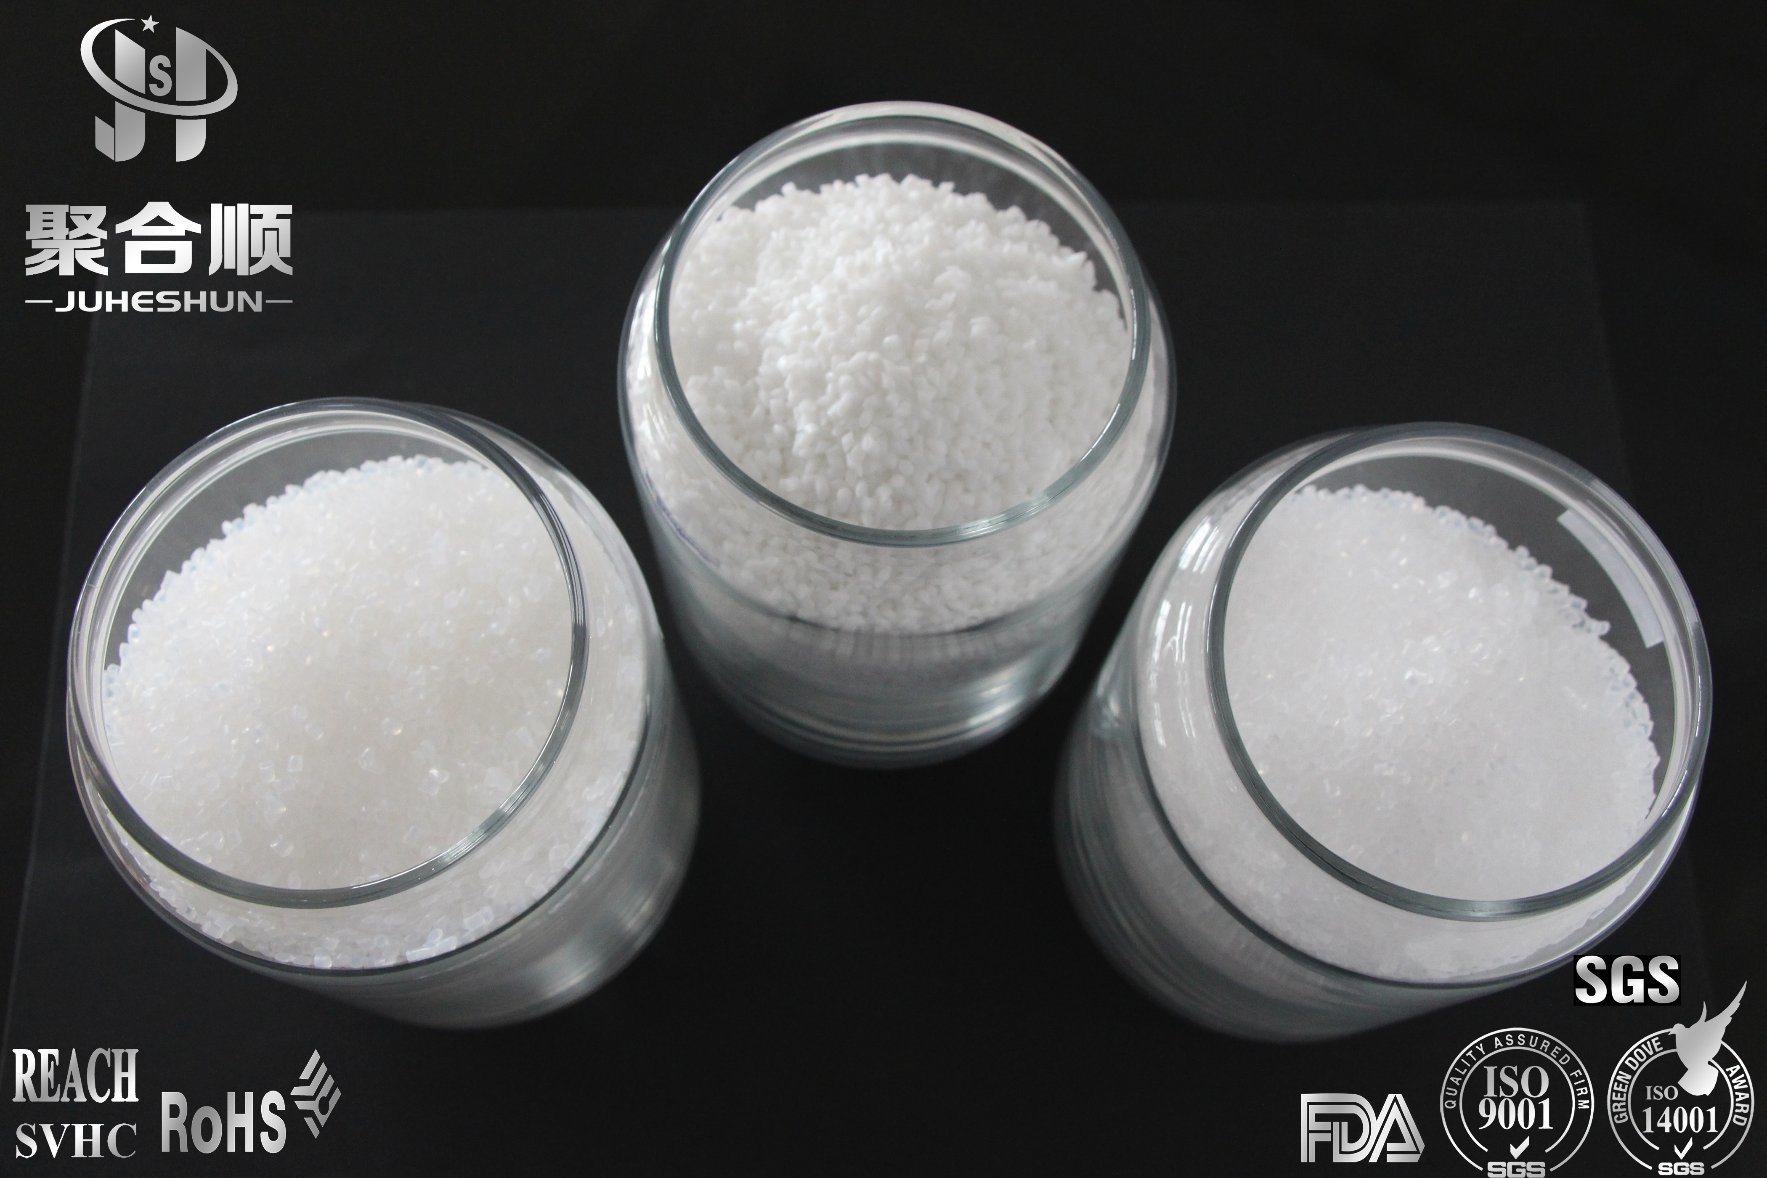 J2403f/Plastic Raw Material Nylon/Polyamide Granules/Pellets/Chips/PA6 Raw Material/Nylon 6 Chips/Polyamide 6 Granules/PA6 -Civilian Spinning Grade PA6